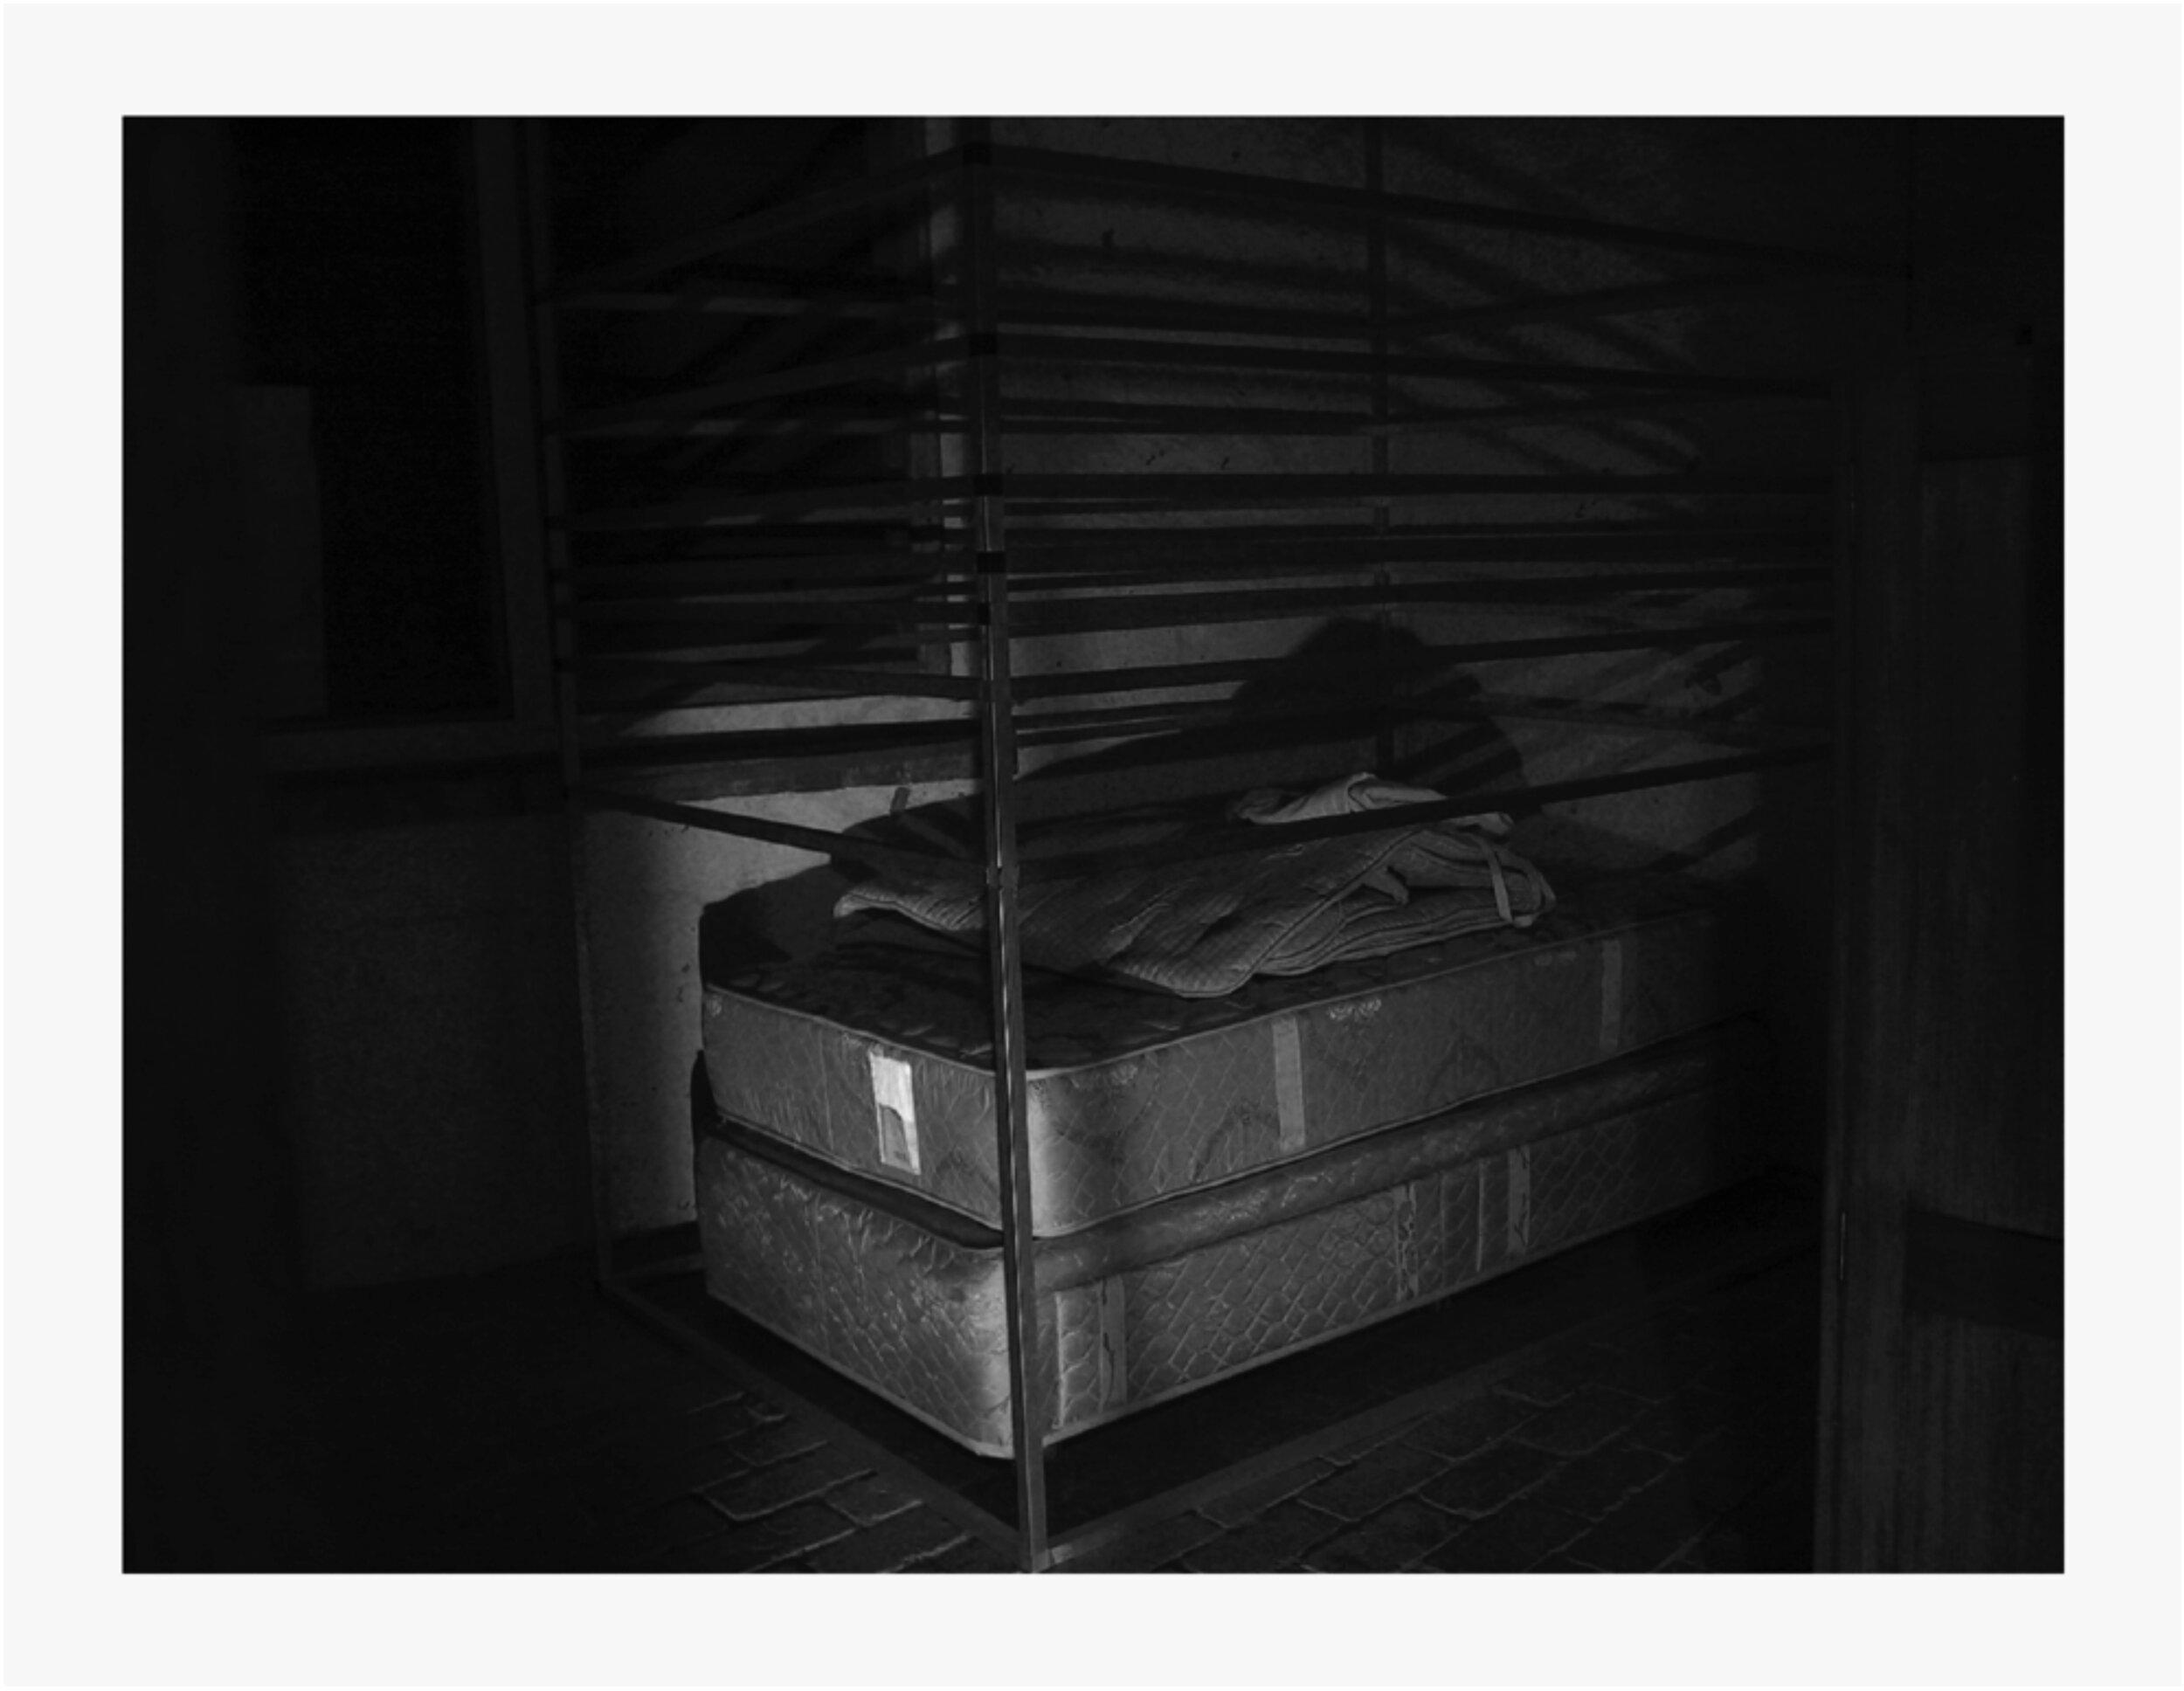 B Bed2.jpg